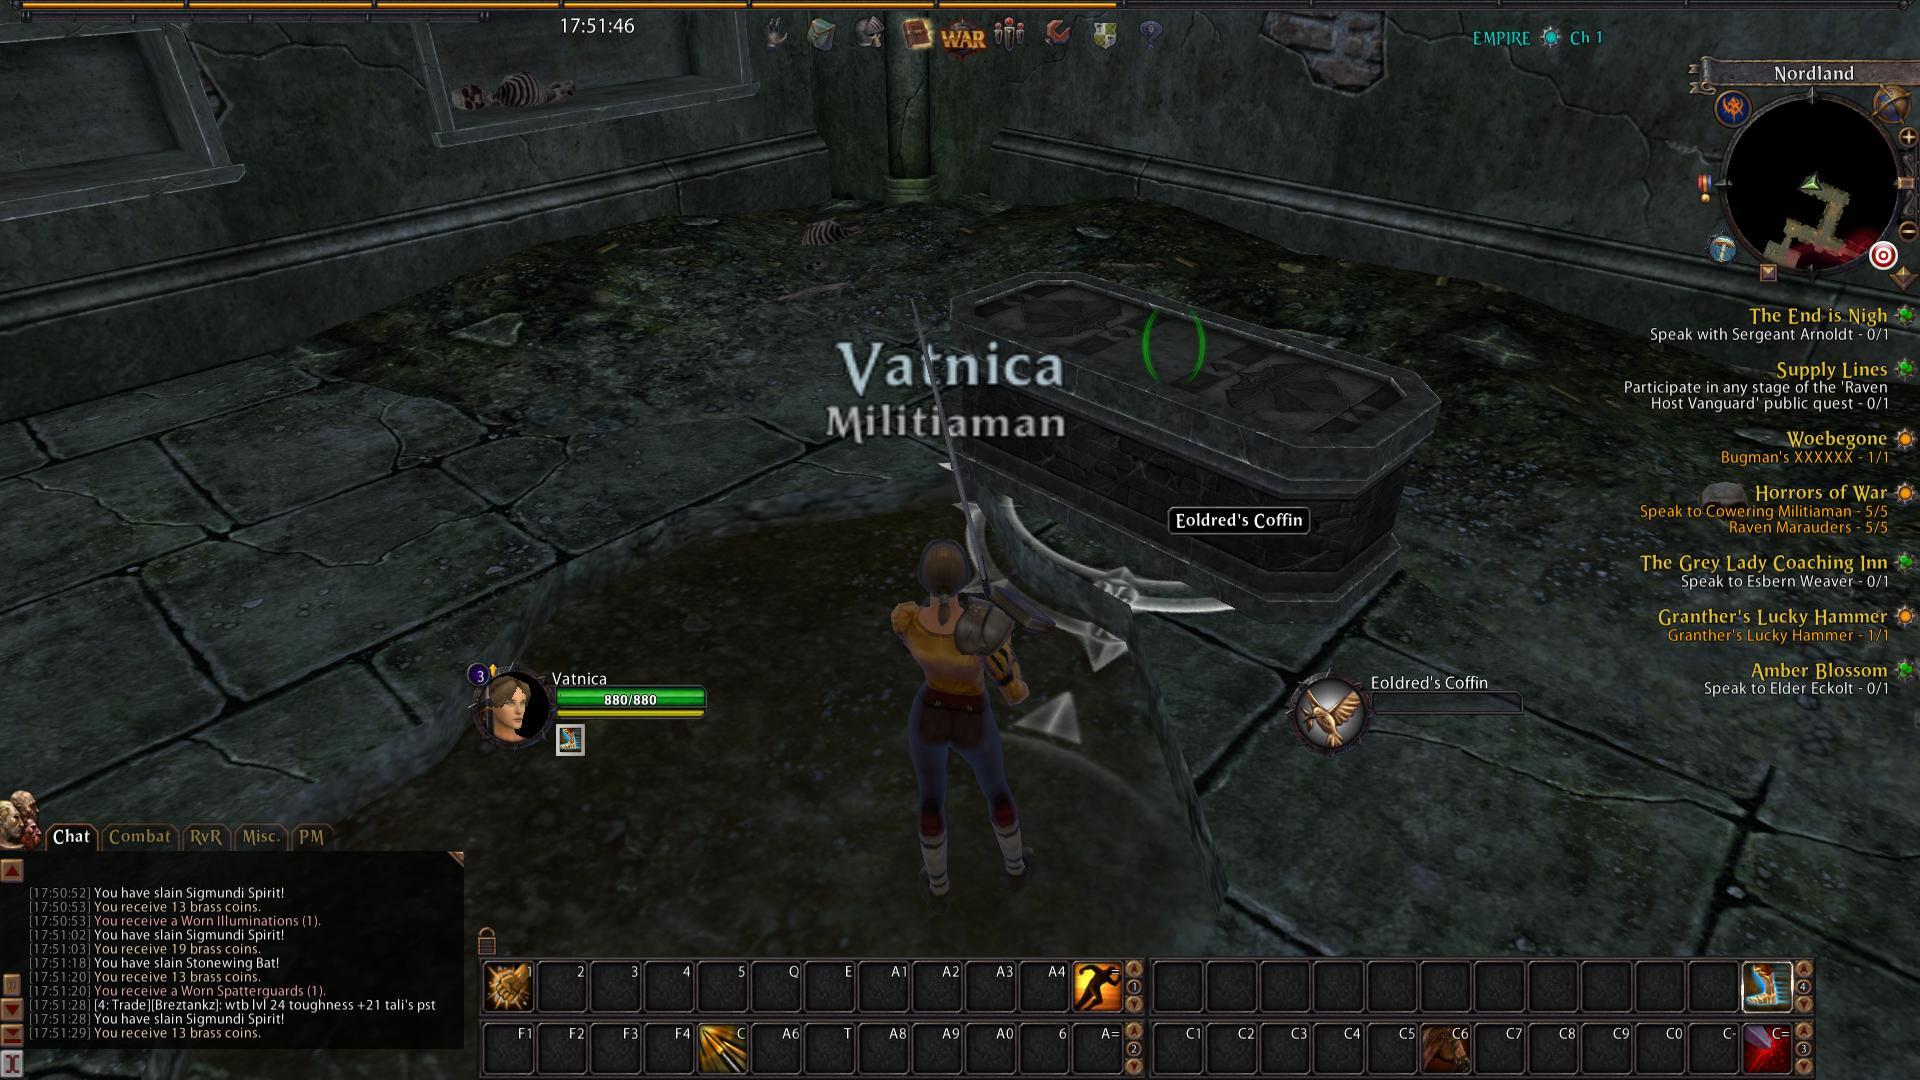 vatnica_000